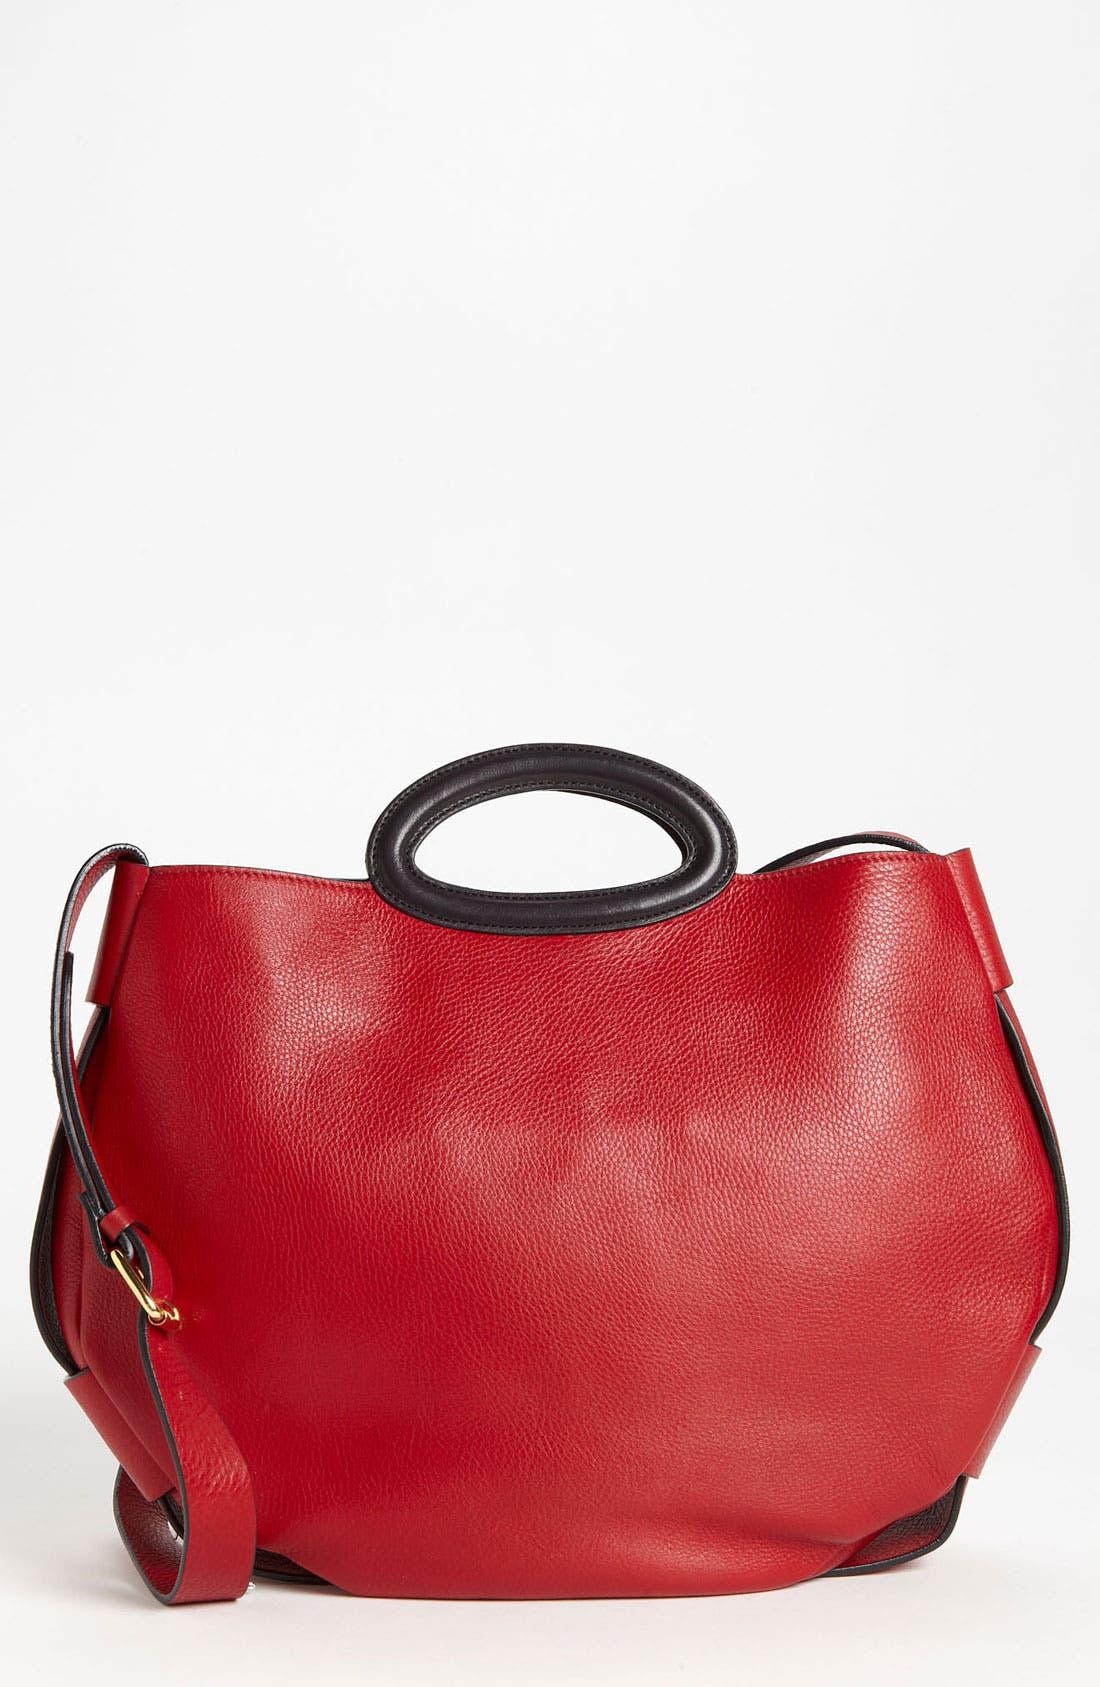 Alternate Image 1 Selected - Marni 'Balloon - Medium' Leather Crossbody Bag